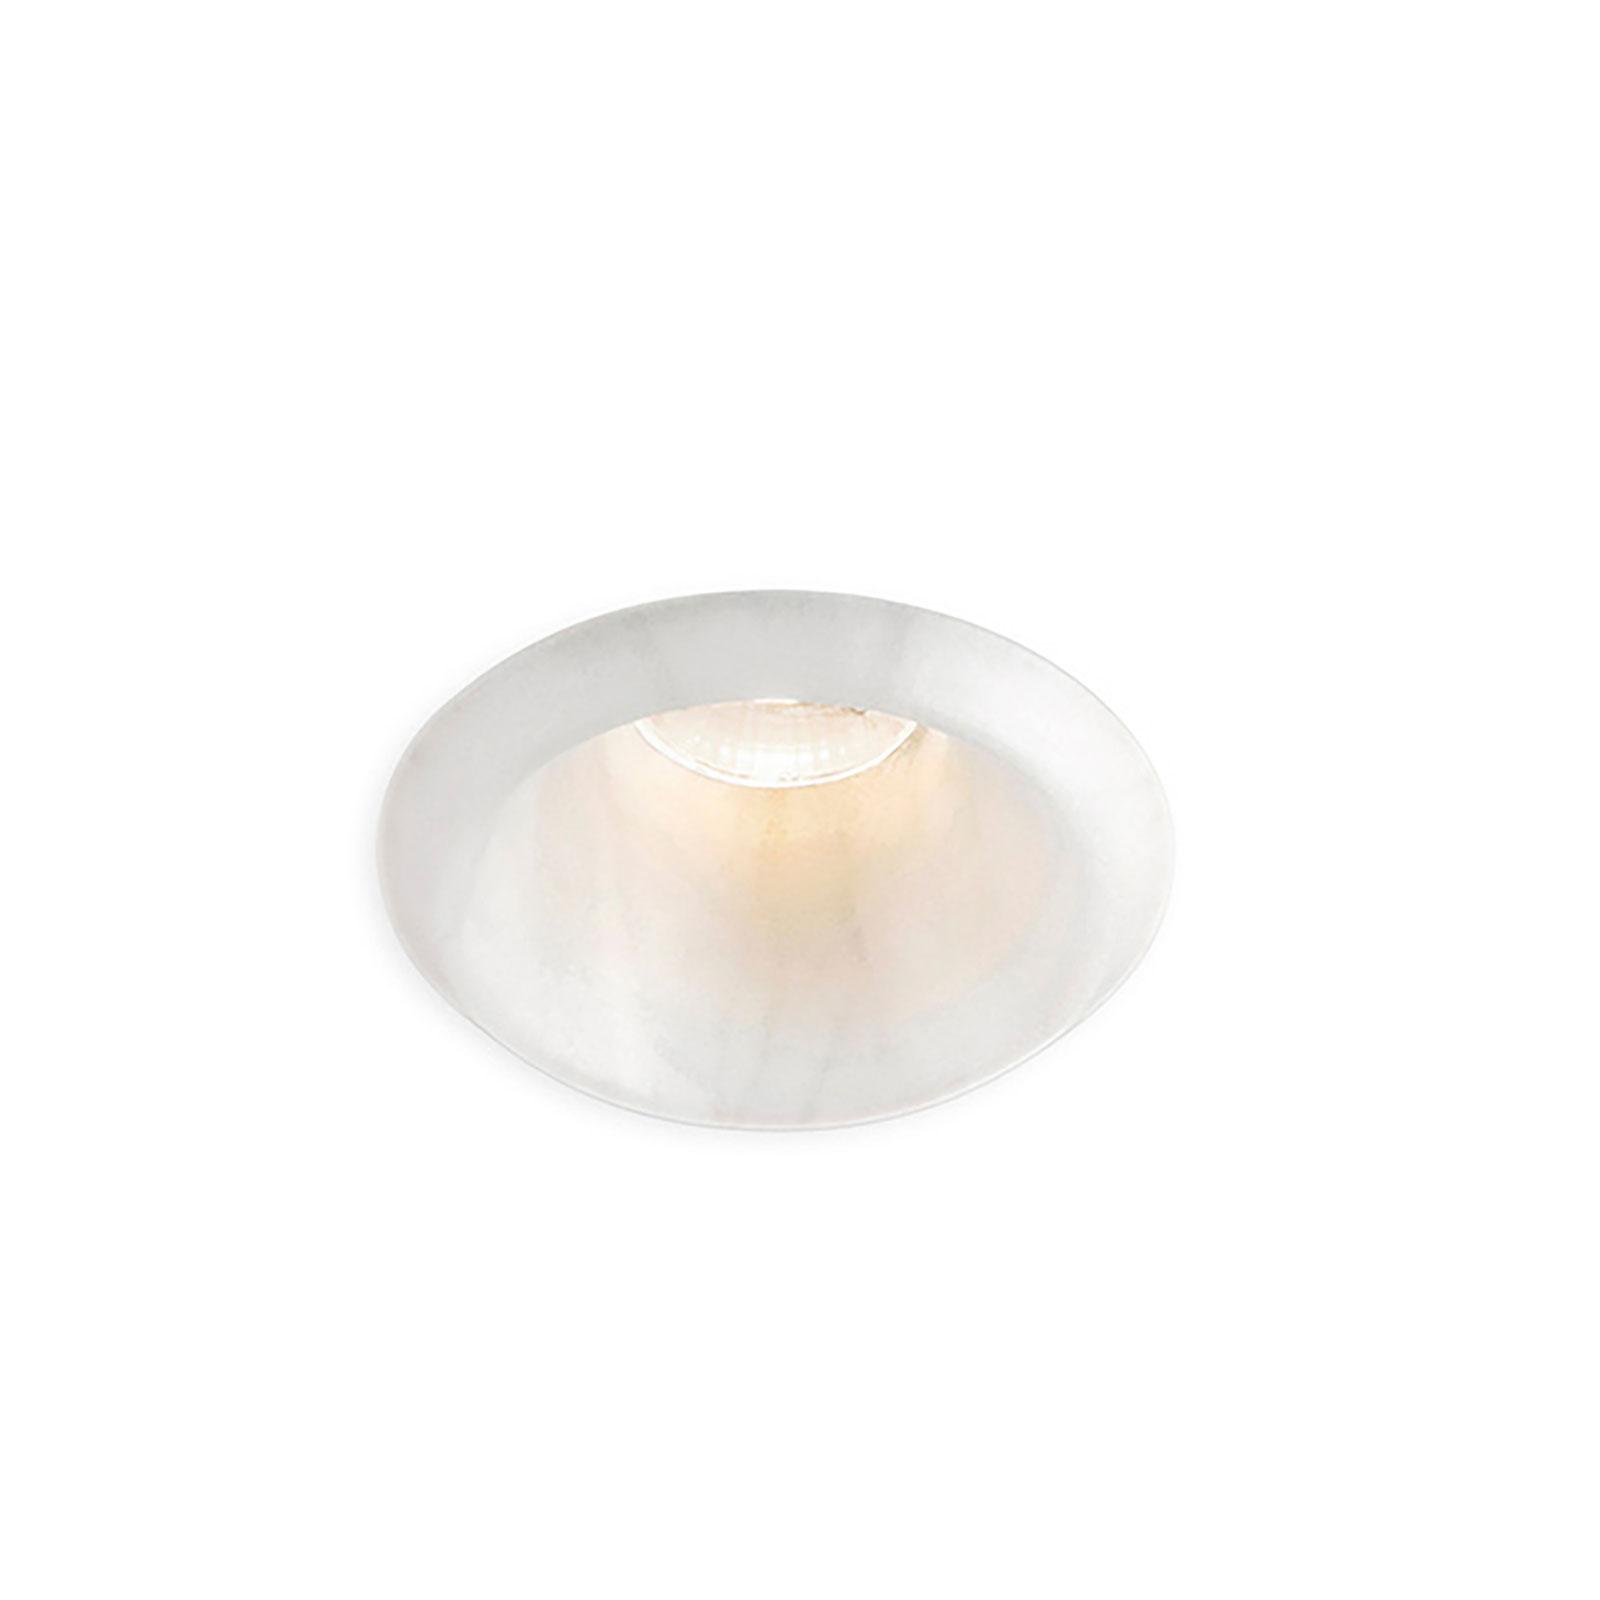 LEDS-C4 Play Raw downlight alabaster 927 12 W 15°